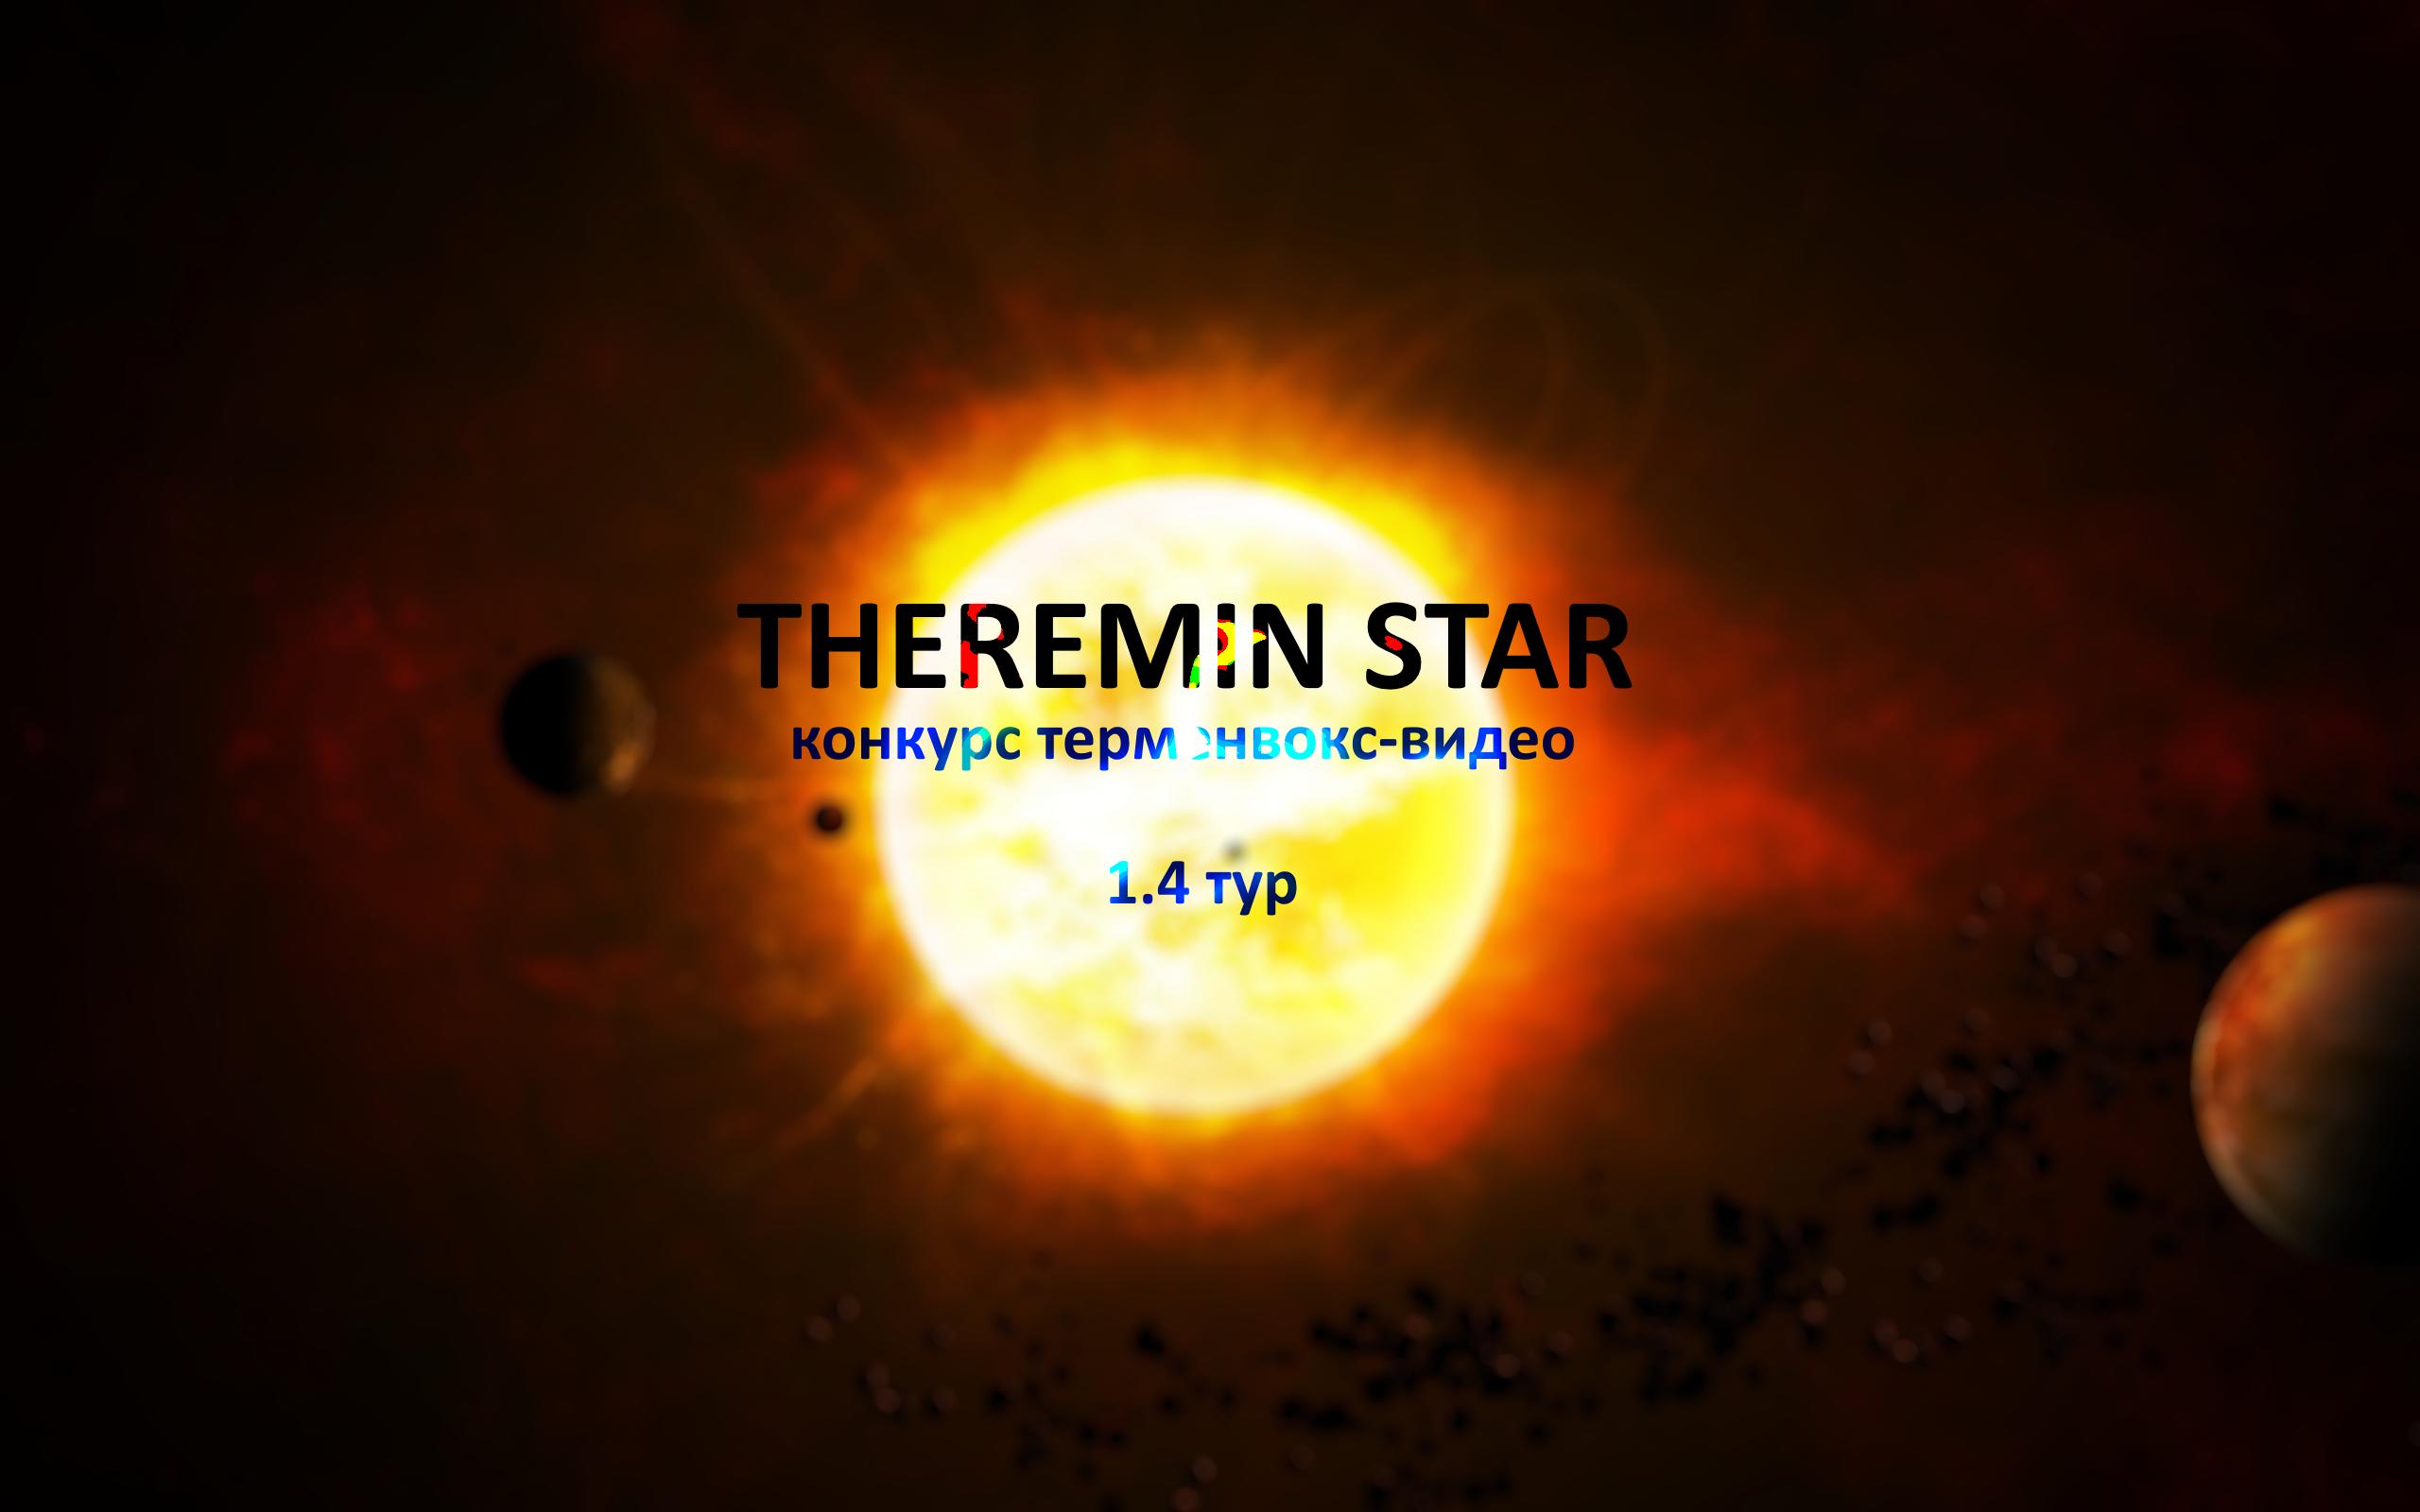 THEREMIN STAR - конкурс терменвокс-видео